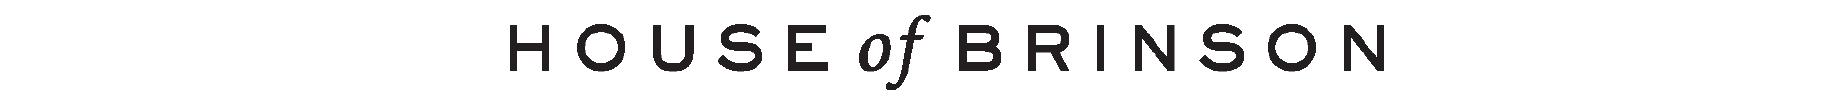 HOB_logo1@2x 2.png